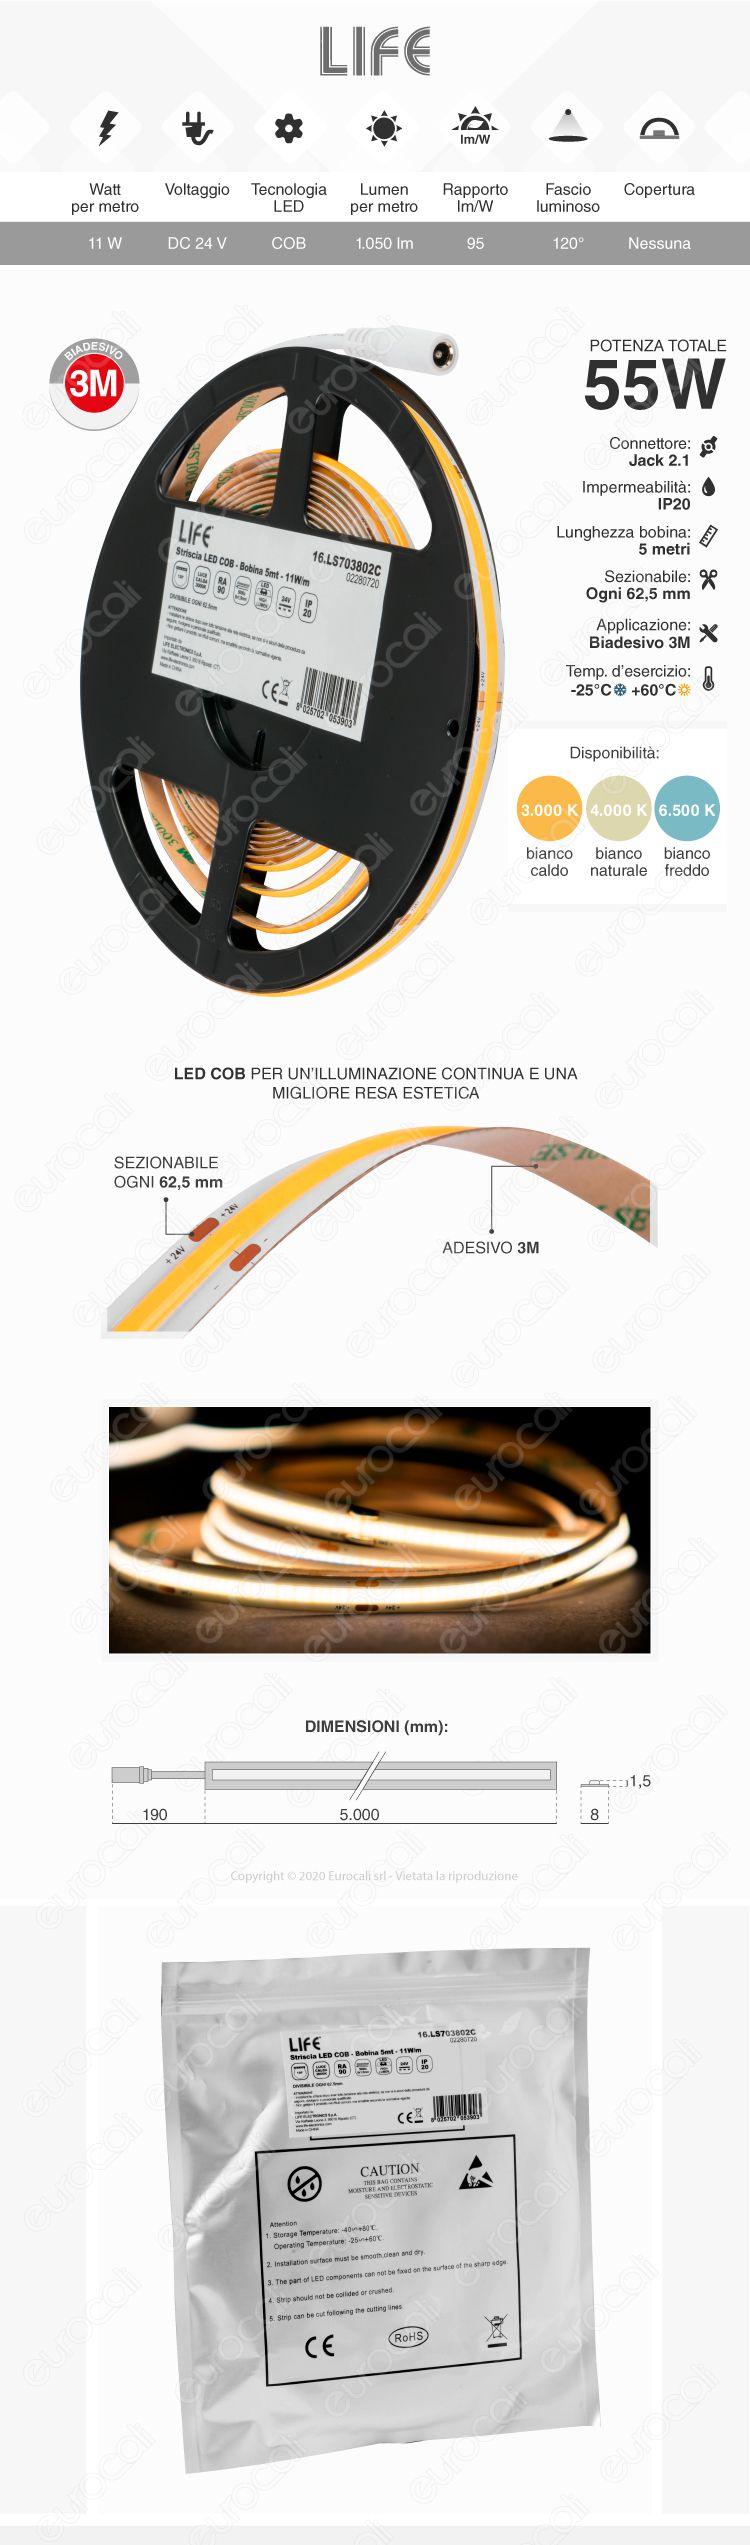 Silvanylux Striscia LED COB